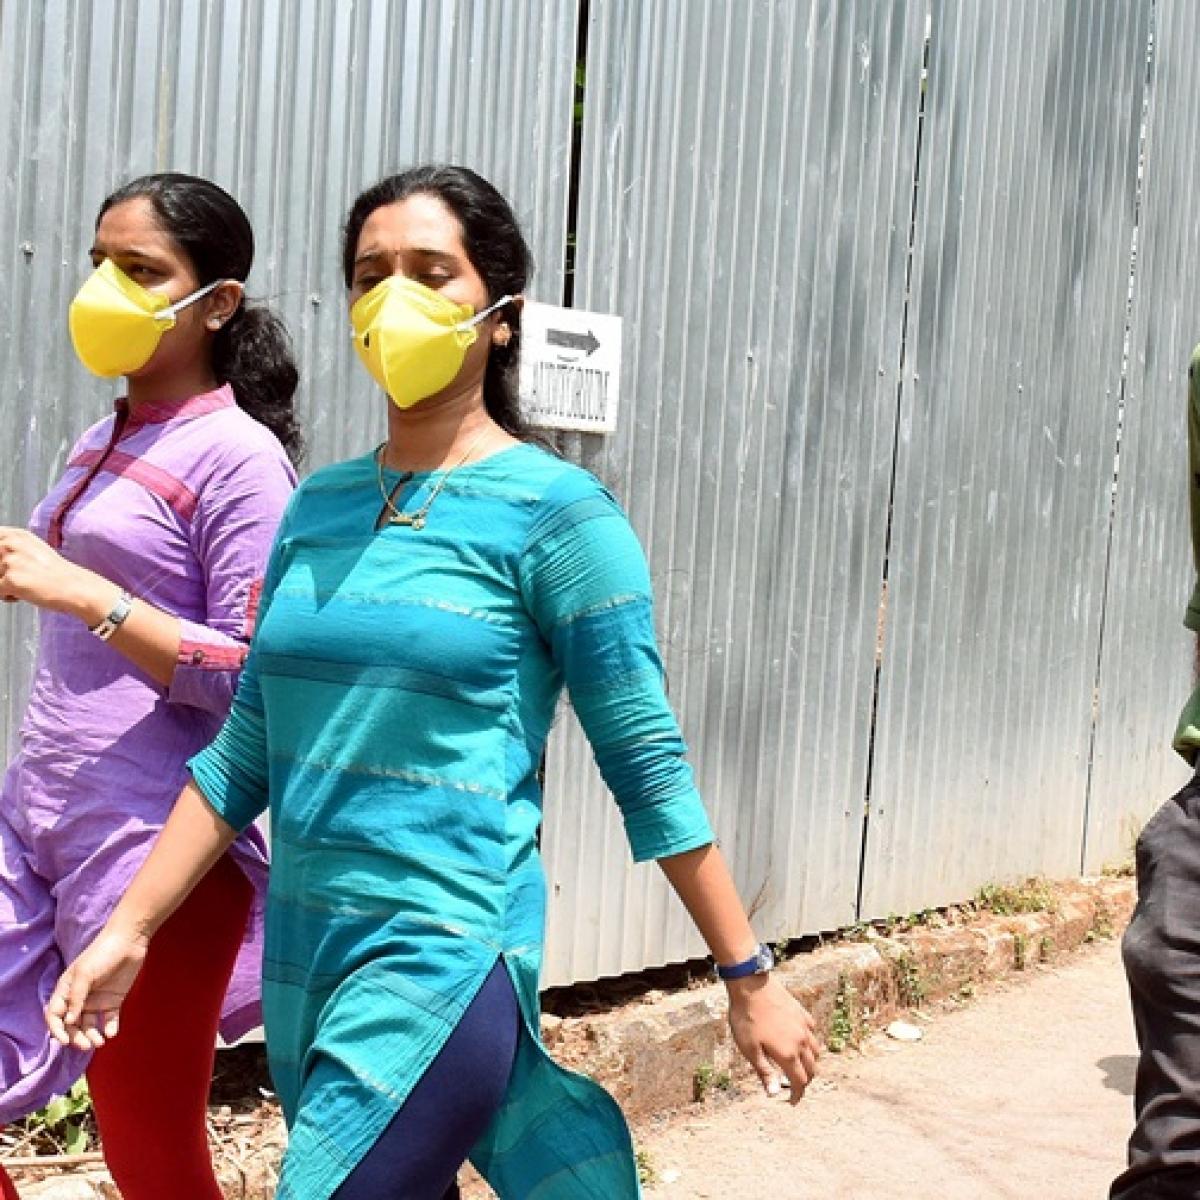 Latest coronavirus update in India: Five test positive in Pune, 6 suspected cases in isolation at Mumbai